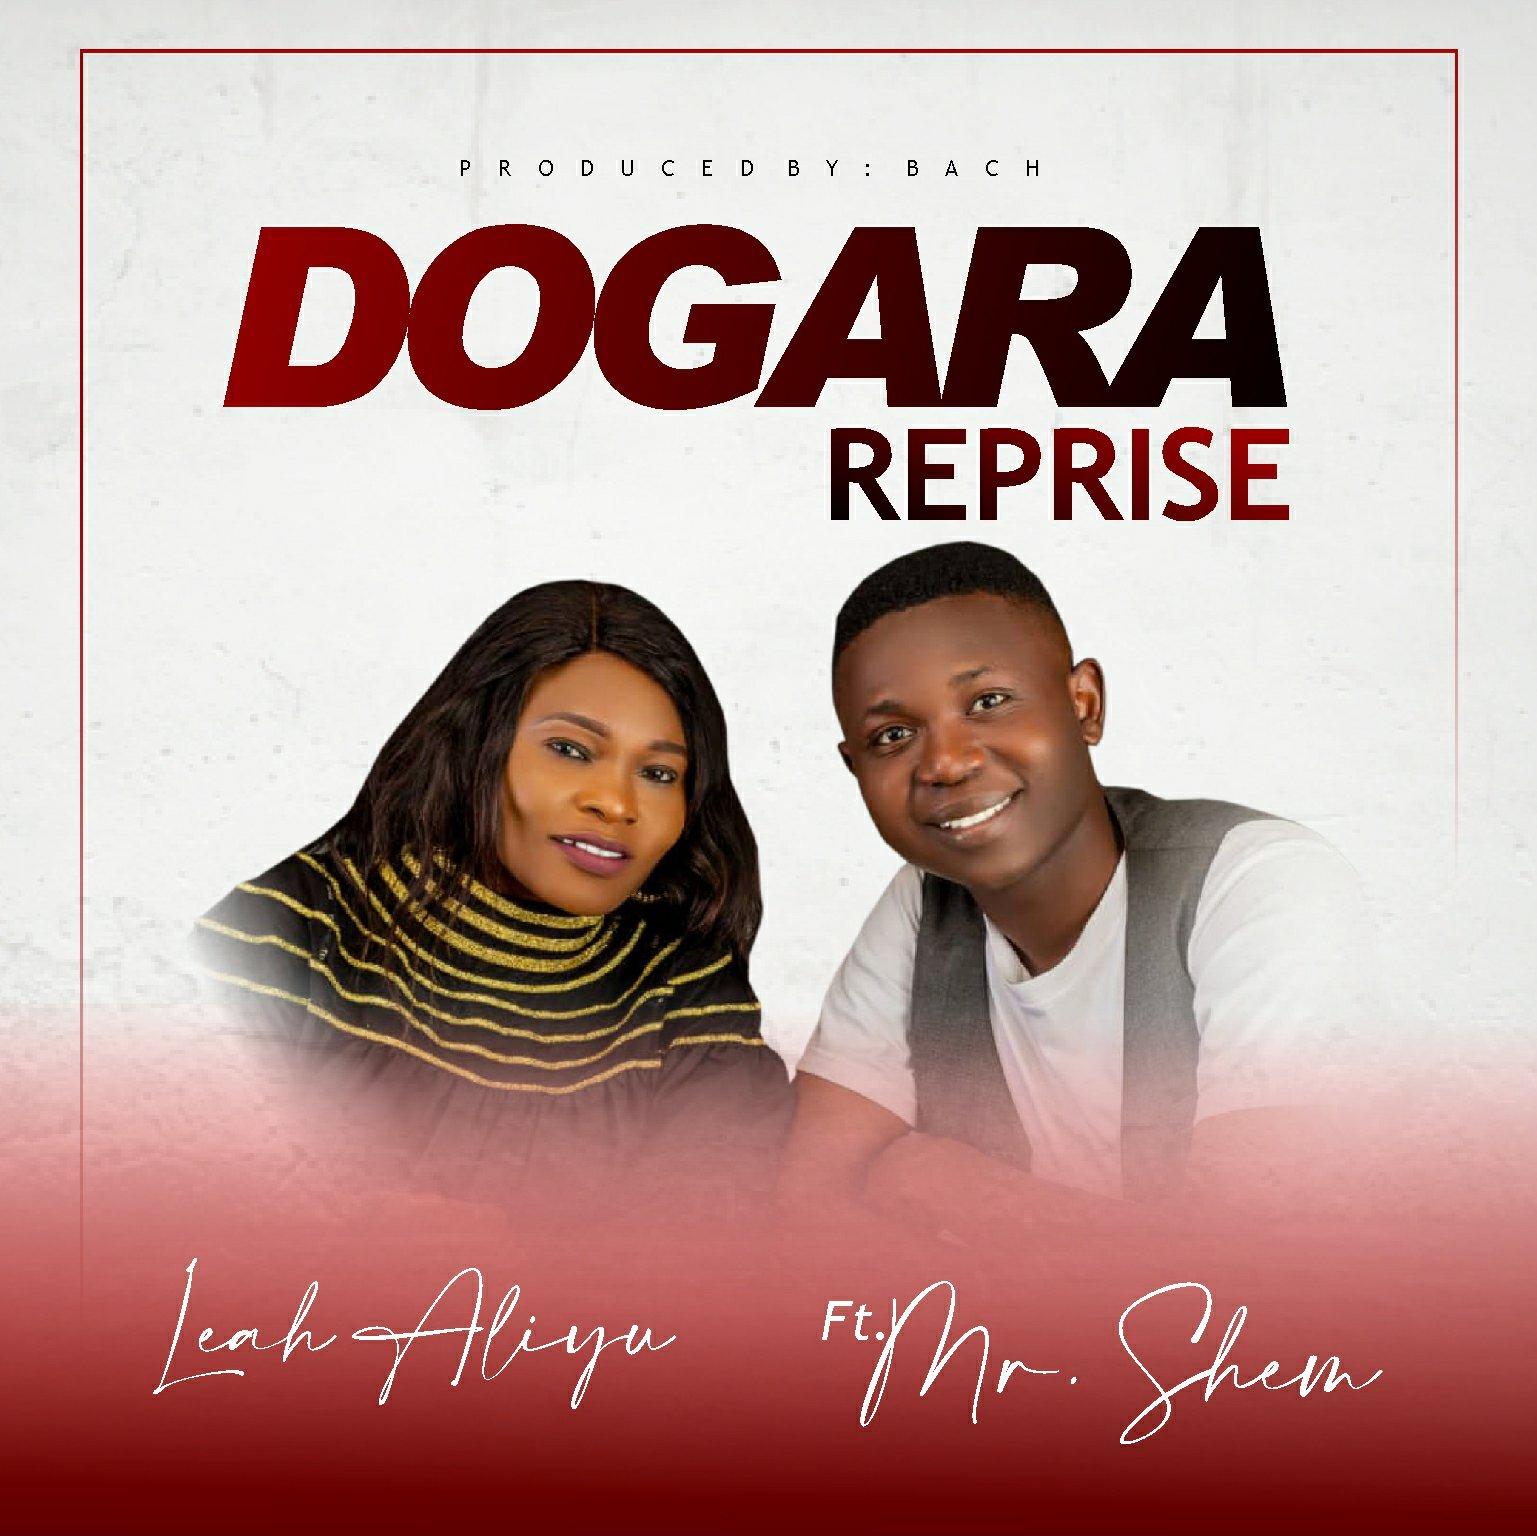 DOWNLOAD Music: Leah Aliyah – Dogara (ft. Mr. Shem)